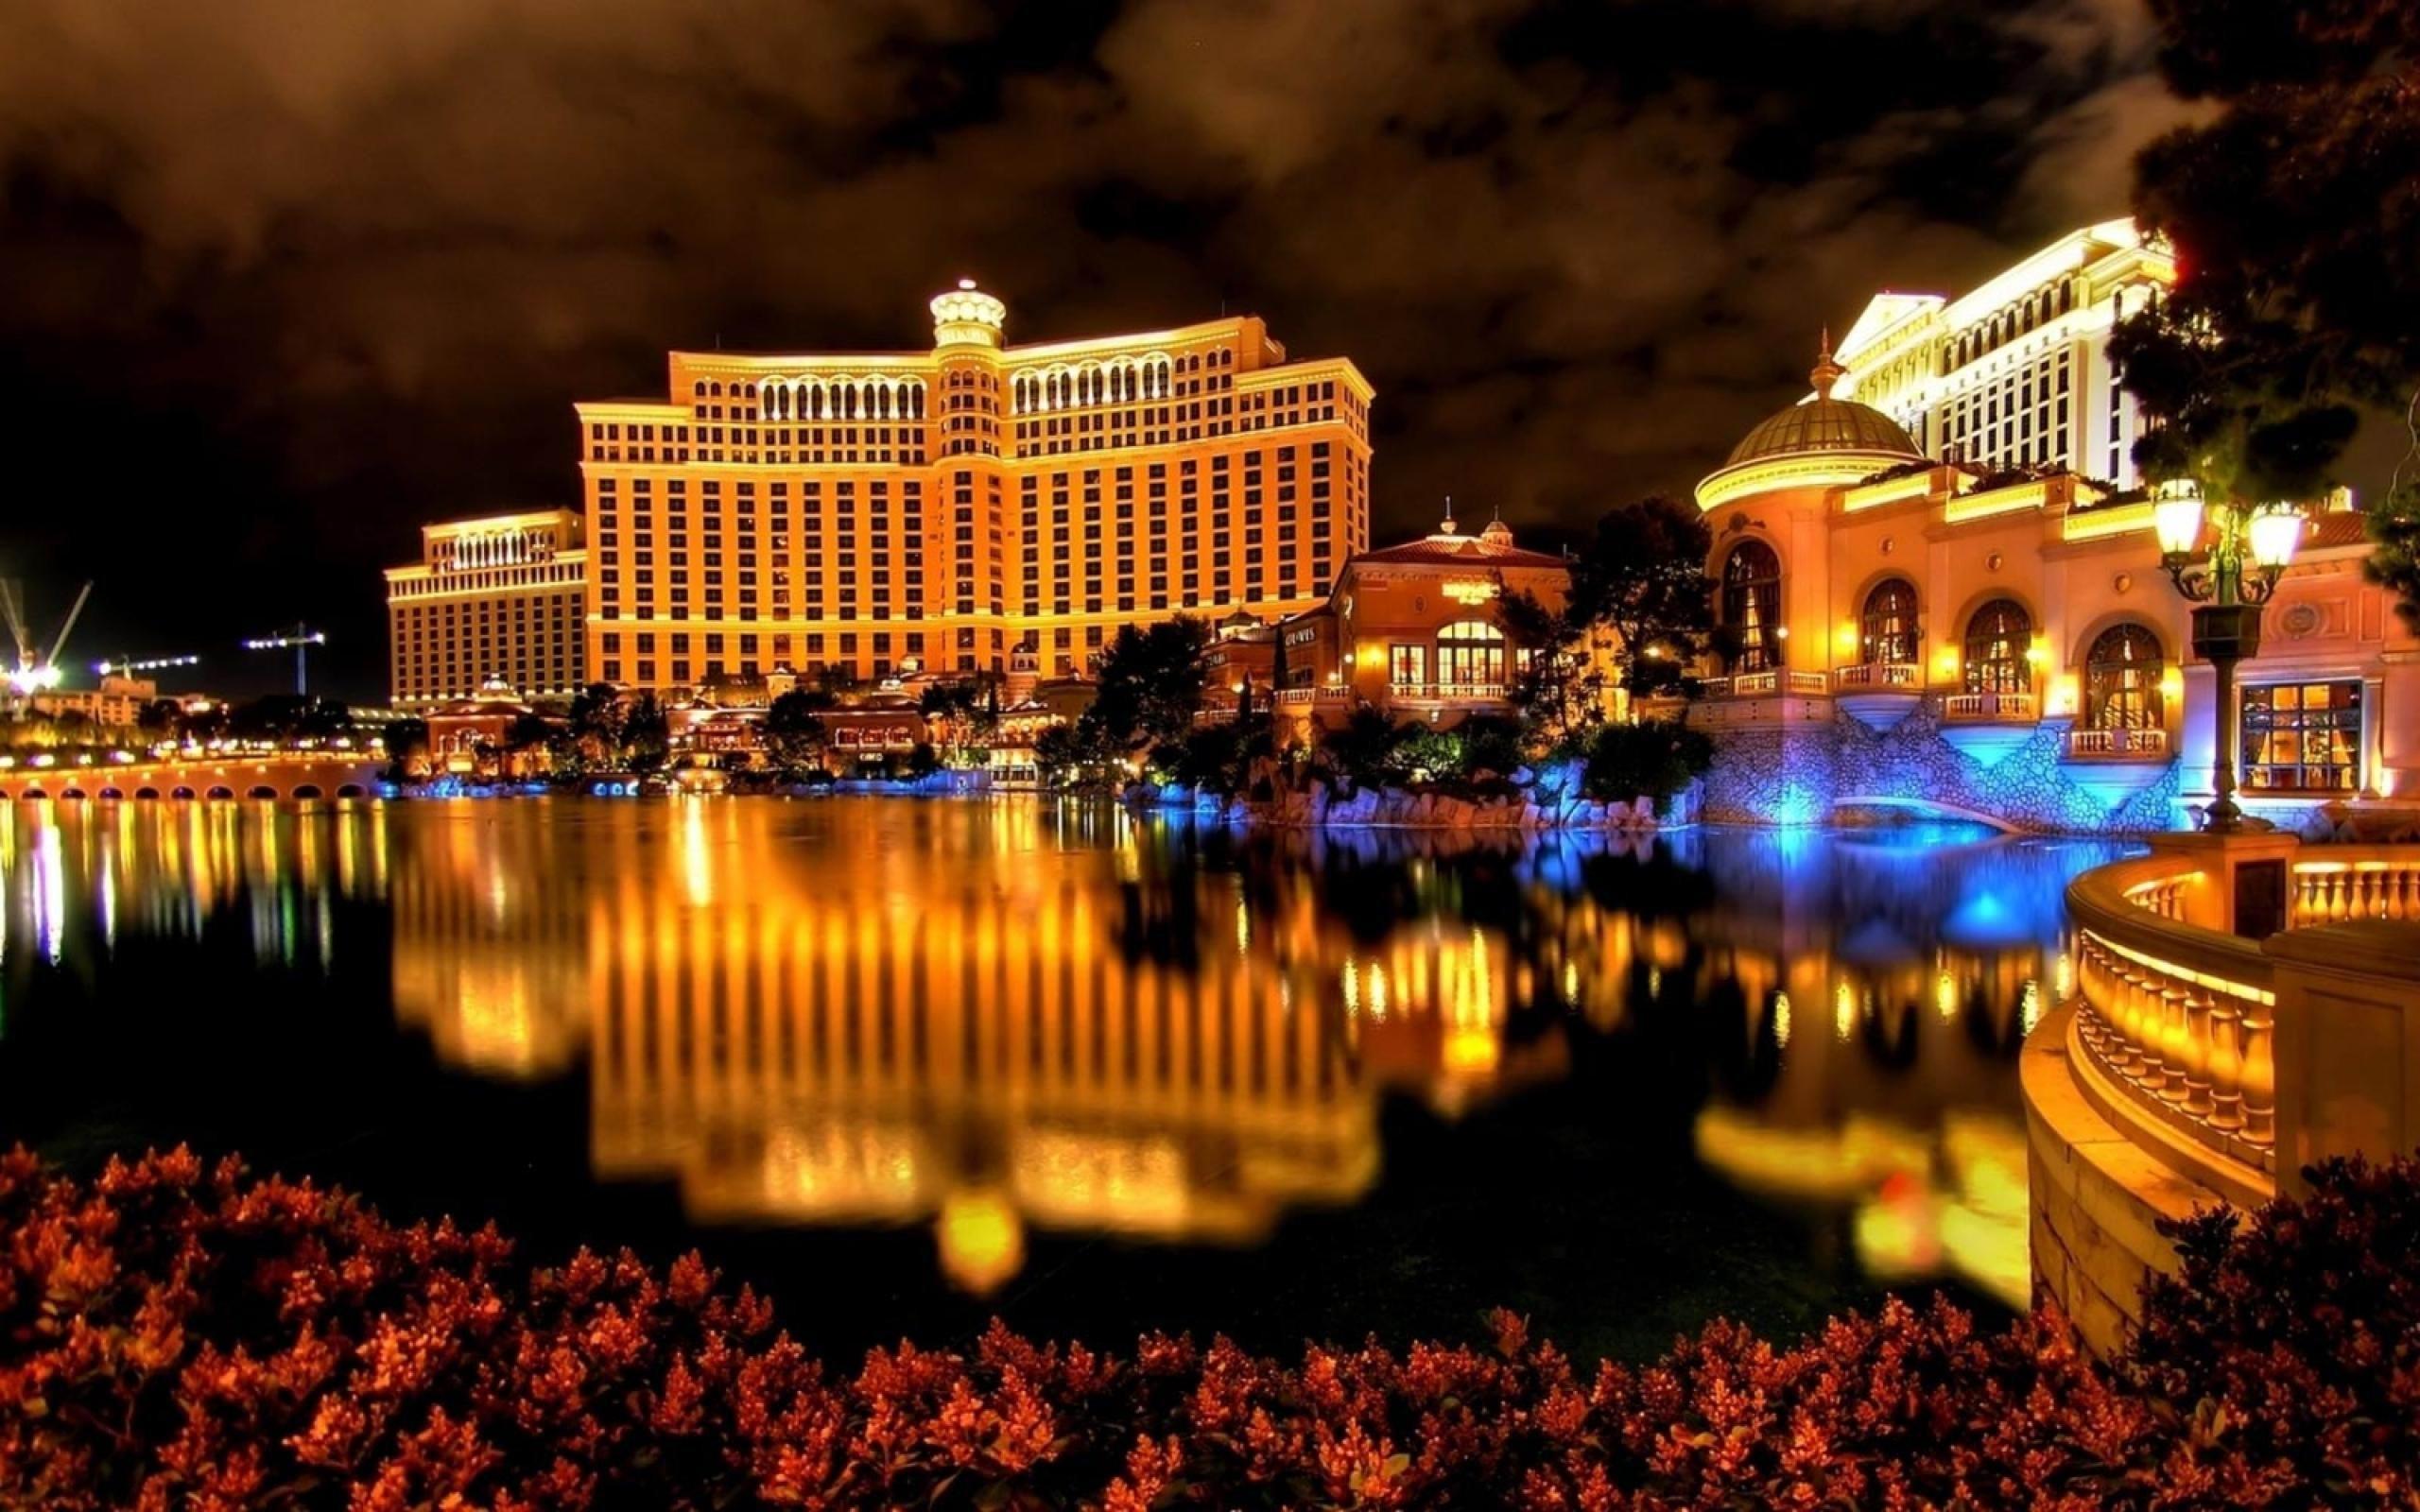 Jck Show Las Vegas May 28th To June 1st 2017